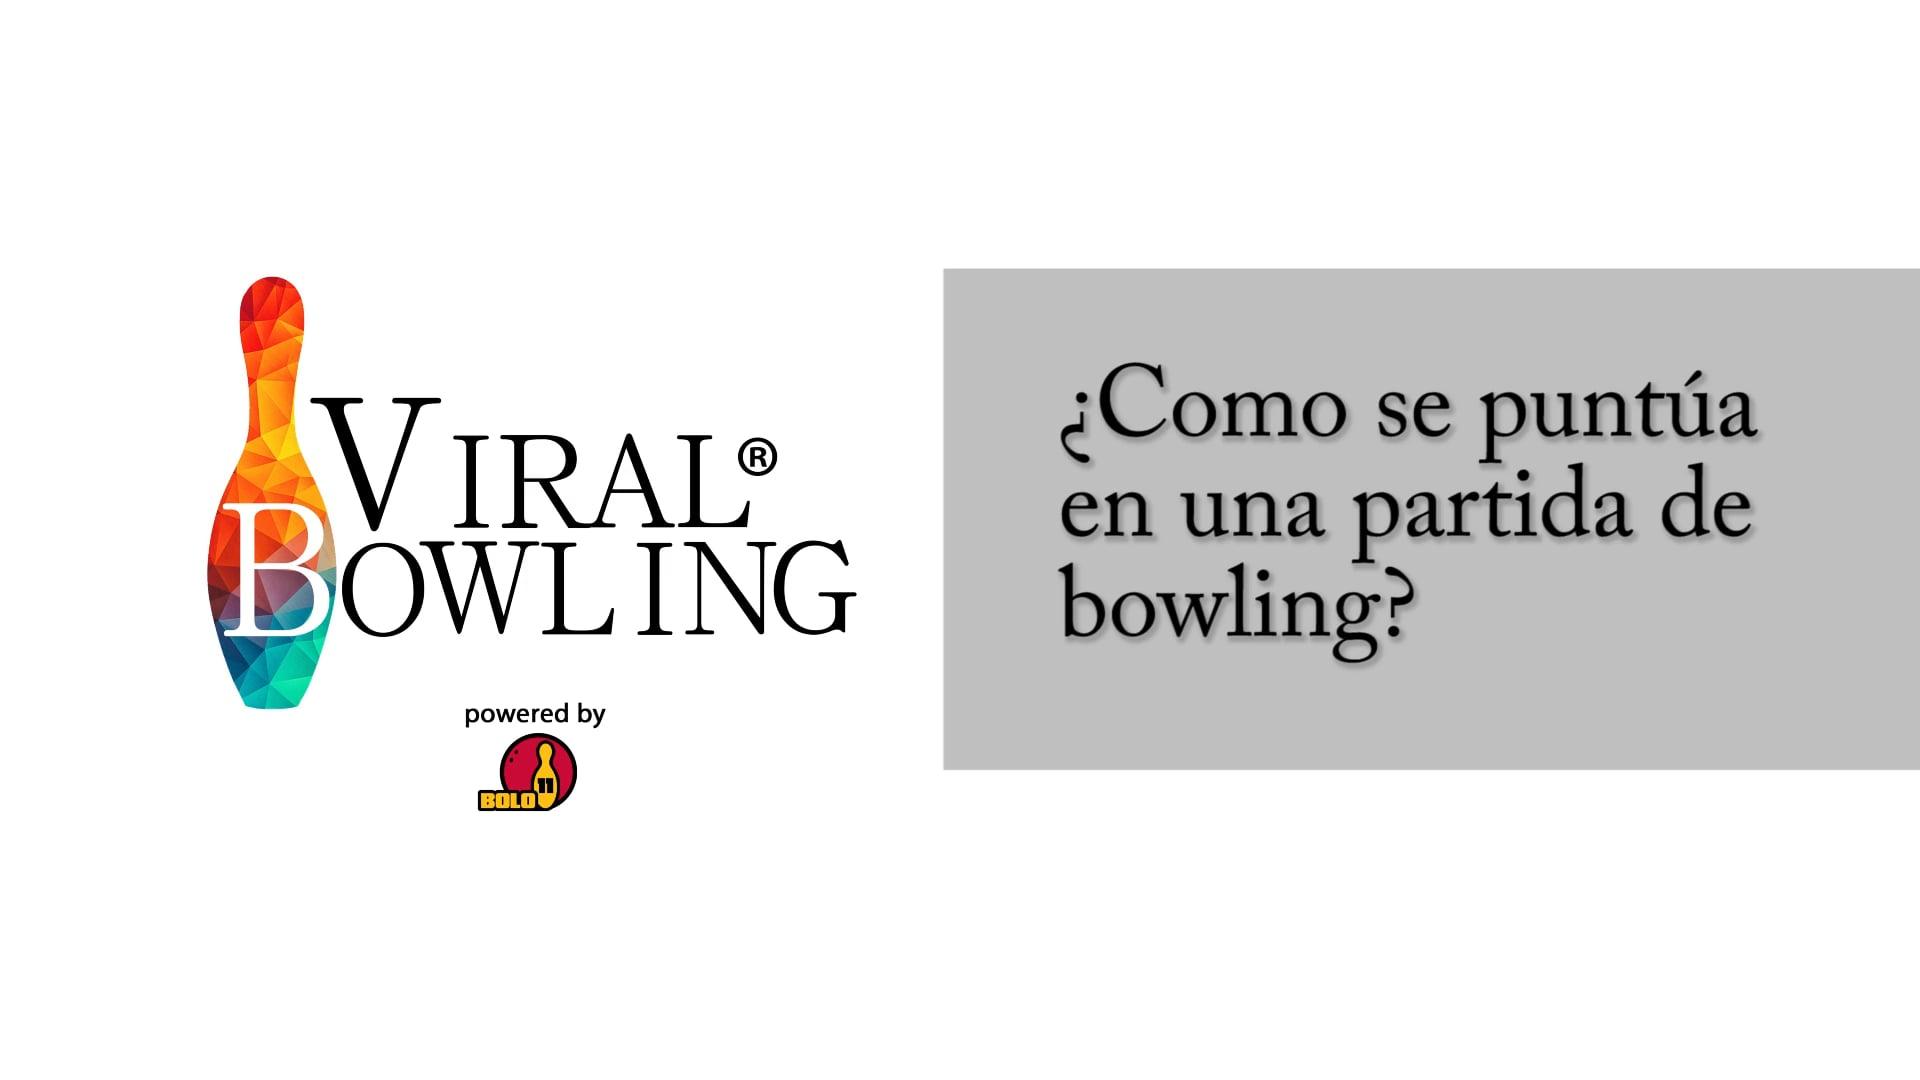 #ViralBowling: Cómo se puntúa en el bowling